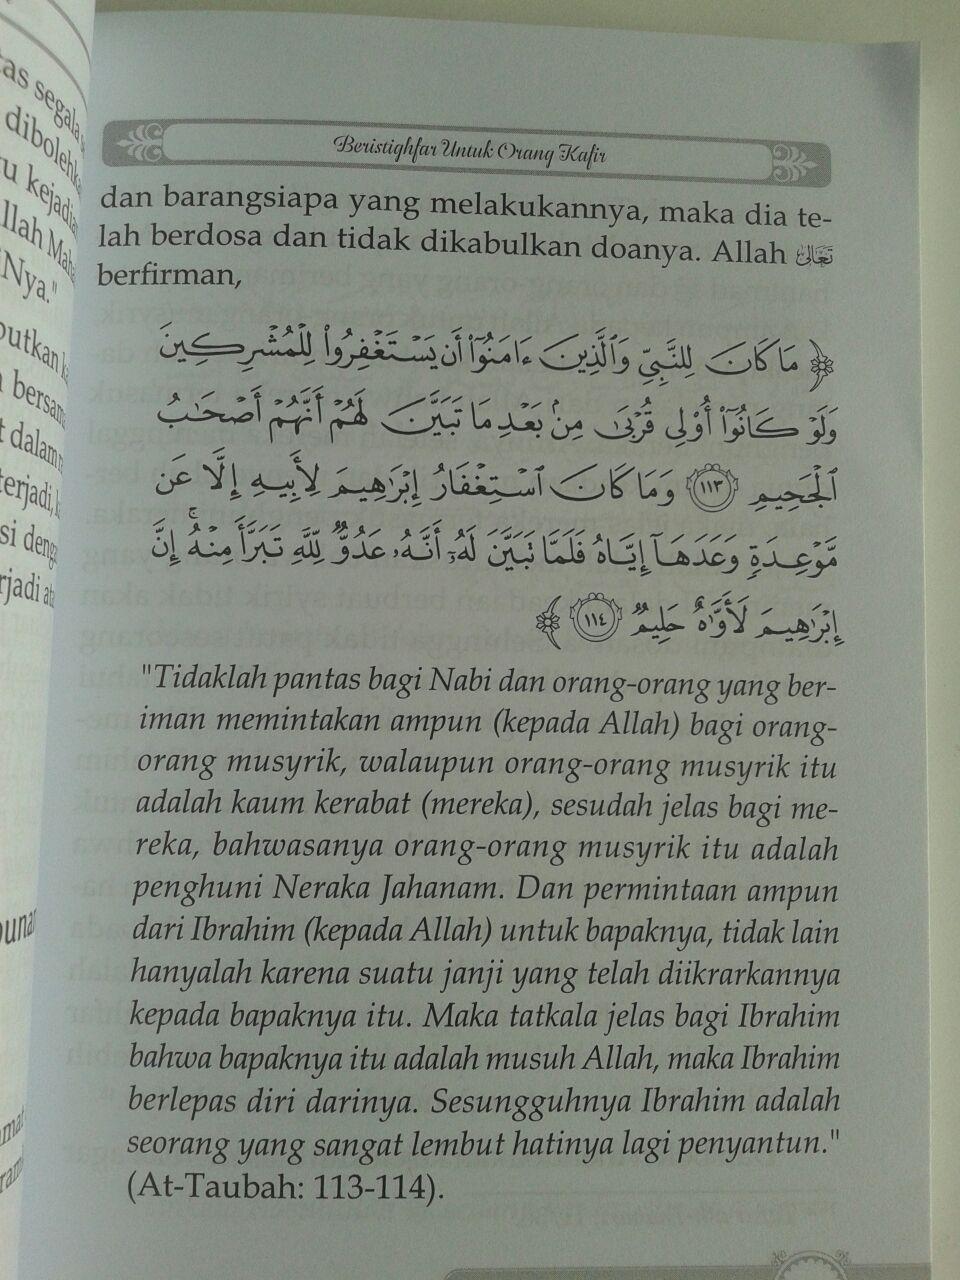 Buku Kesalahan Kesalahan Dalam Berdoa isi 3